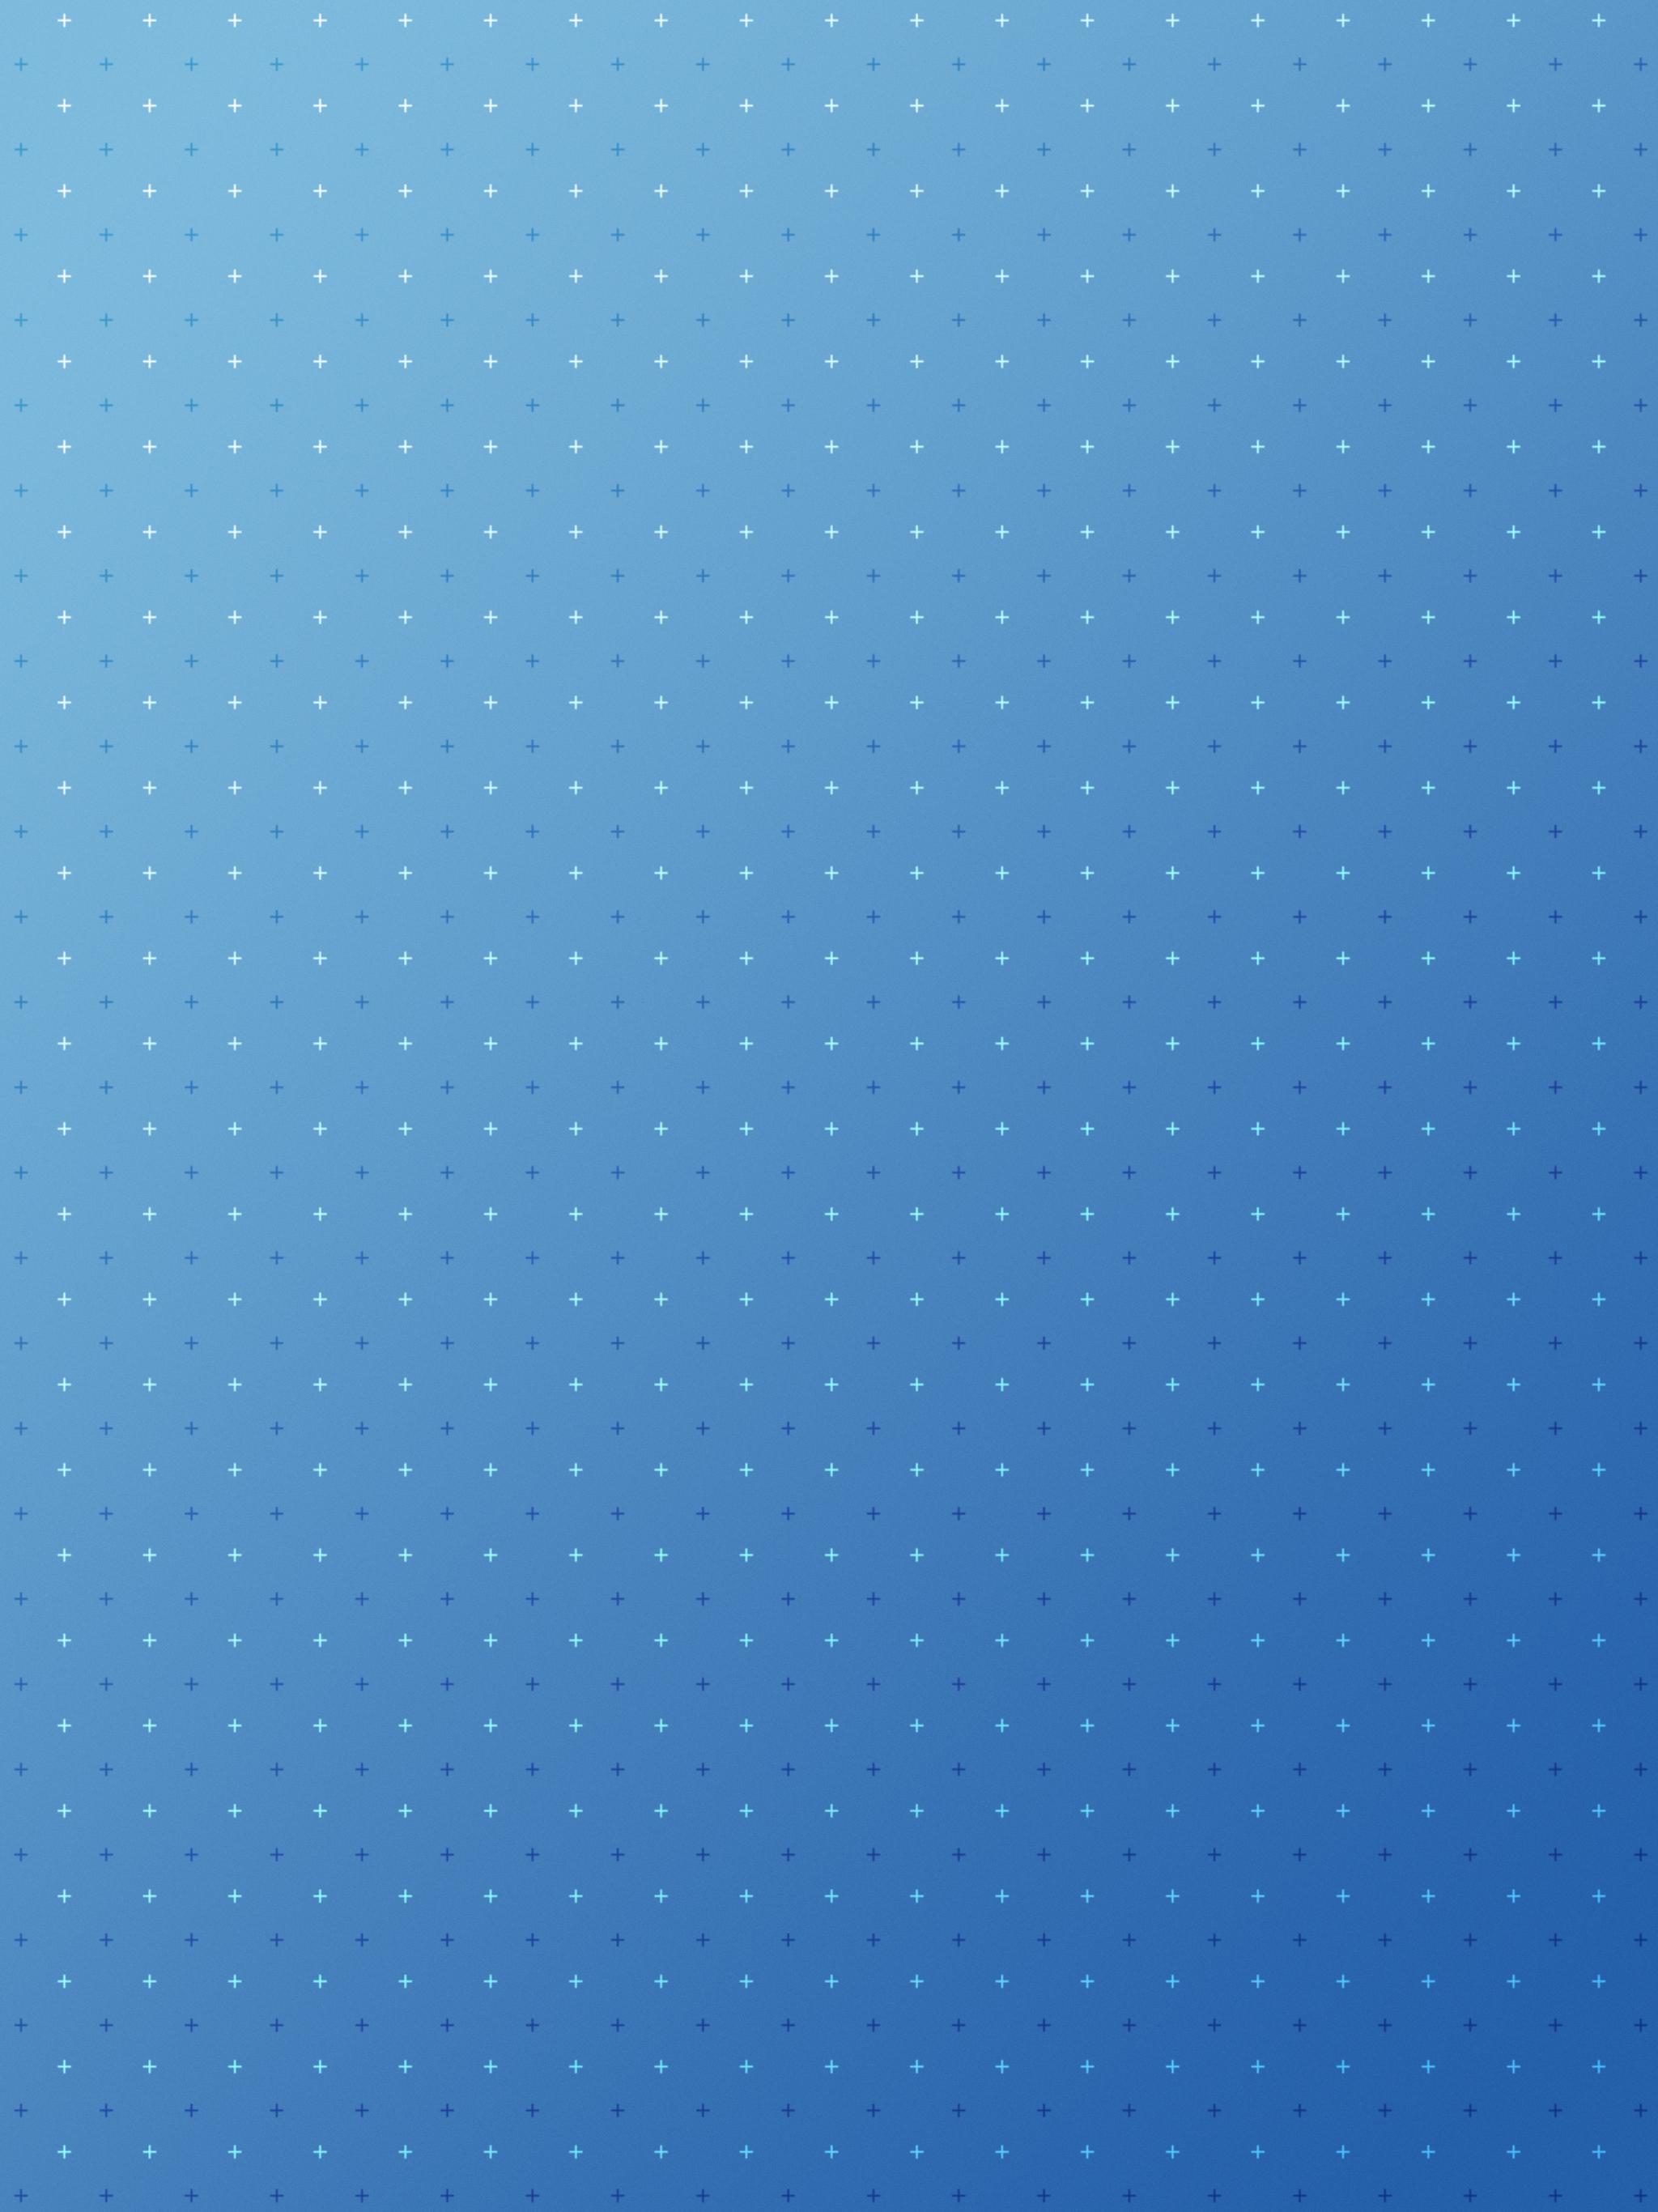 Gradient wallpapers for iPhone, iPad, Apple Watch and desktop